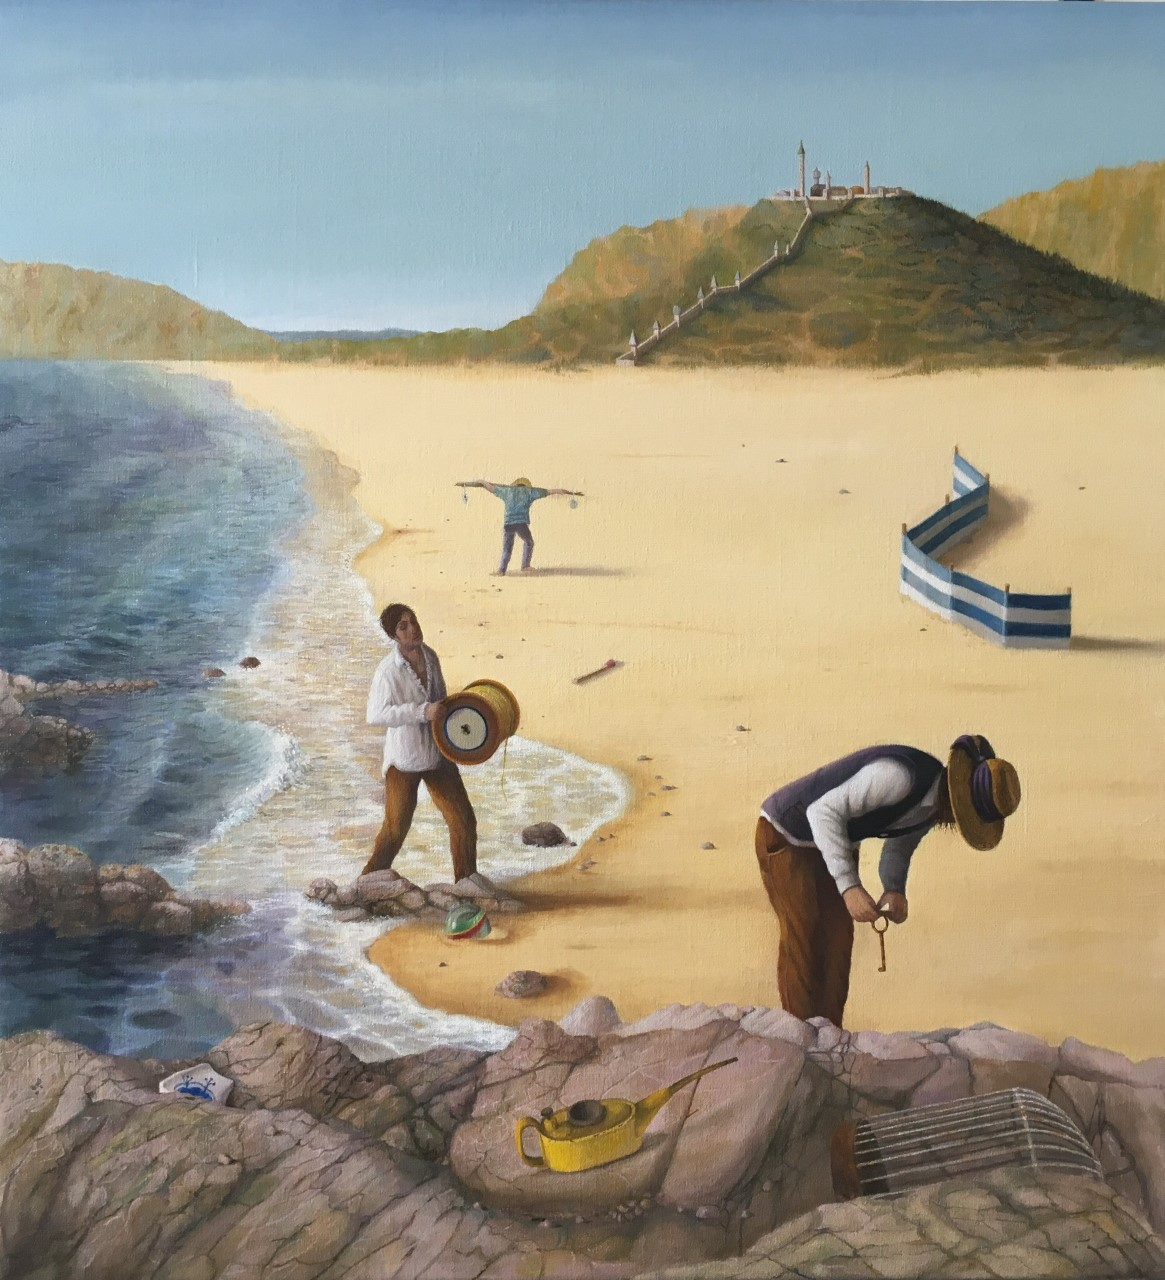 "'Beachcombing', 2018, oil on linen, 26"" x 24"""